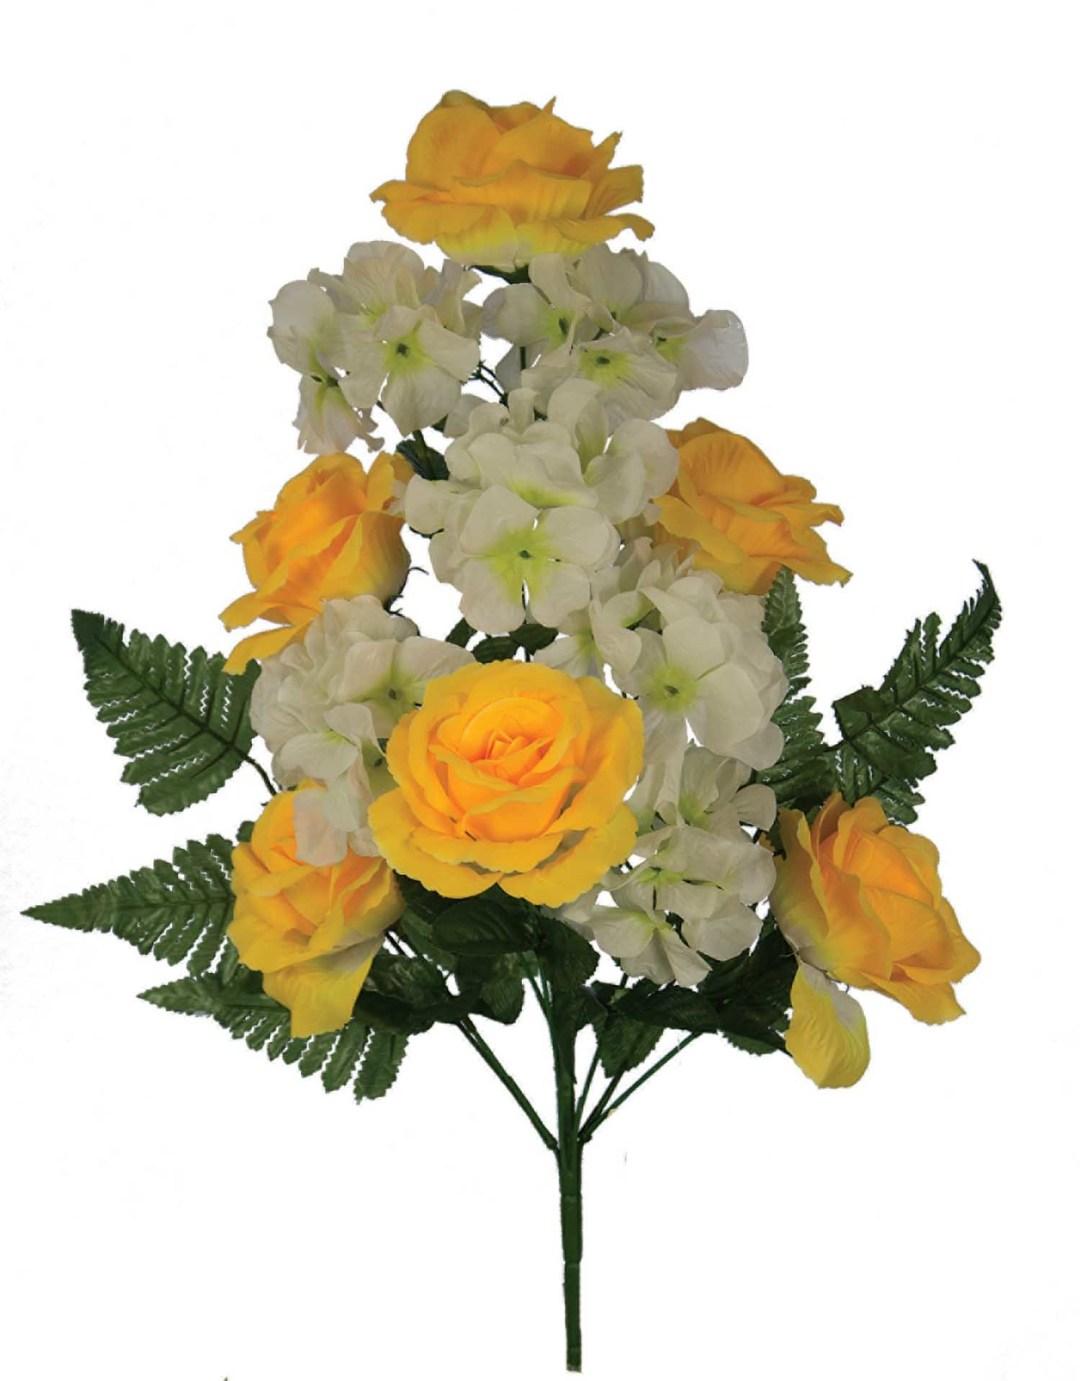 "SB3005YELL - 18"" One Sided Open Rose / Hydrangea Mix x12 $3.95 each SB3005YELL"